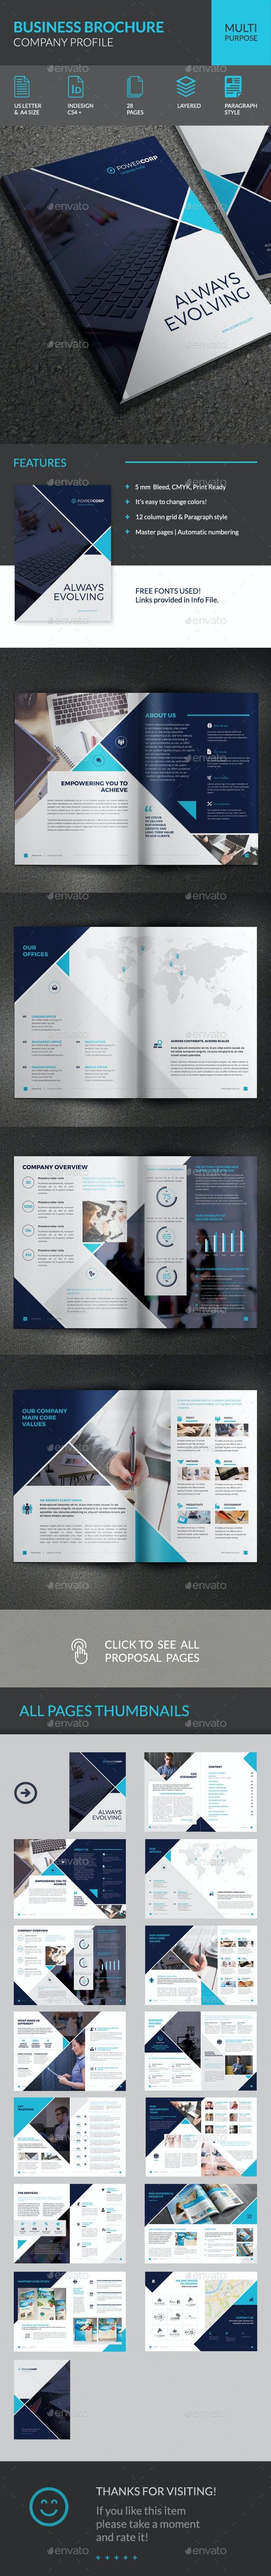 PowerCorp Business Brochure - Corporate Profile - Corporate Brochures